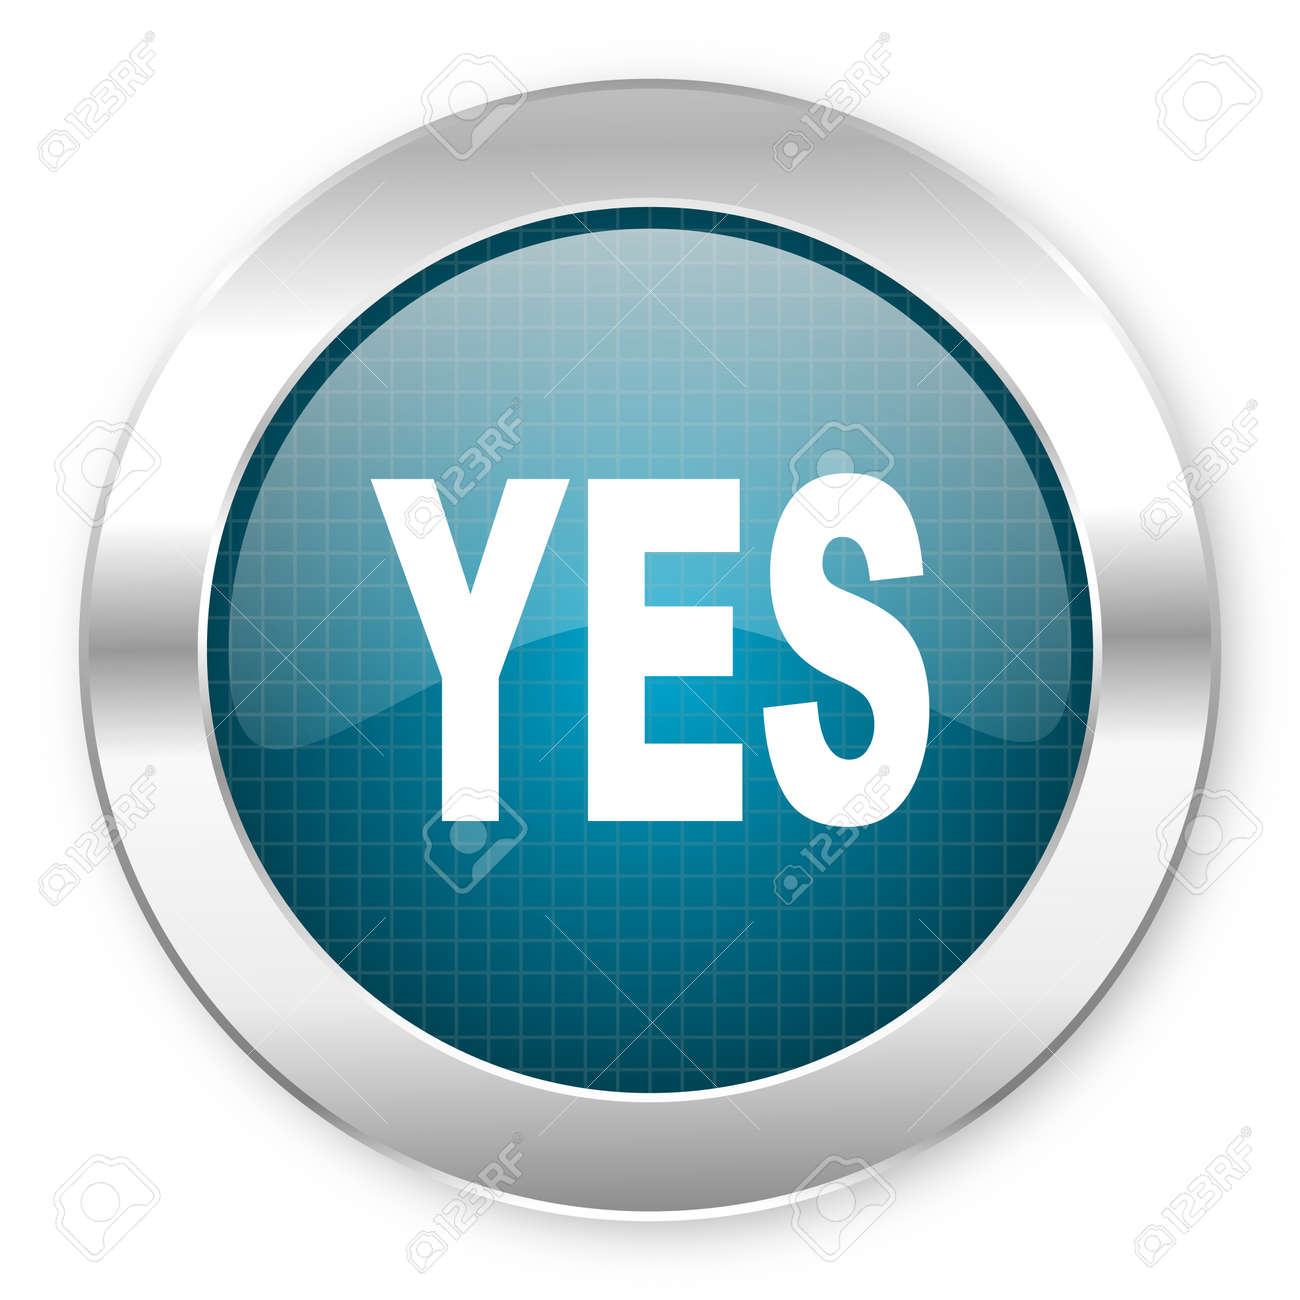 yes icon Stock Photo - 21081698